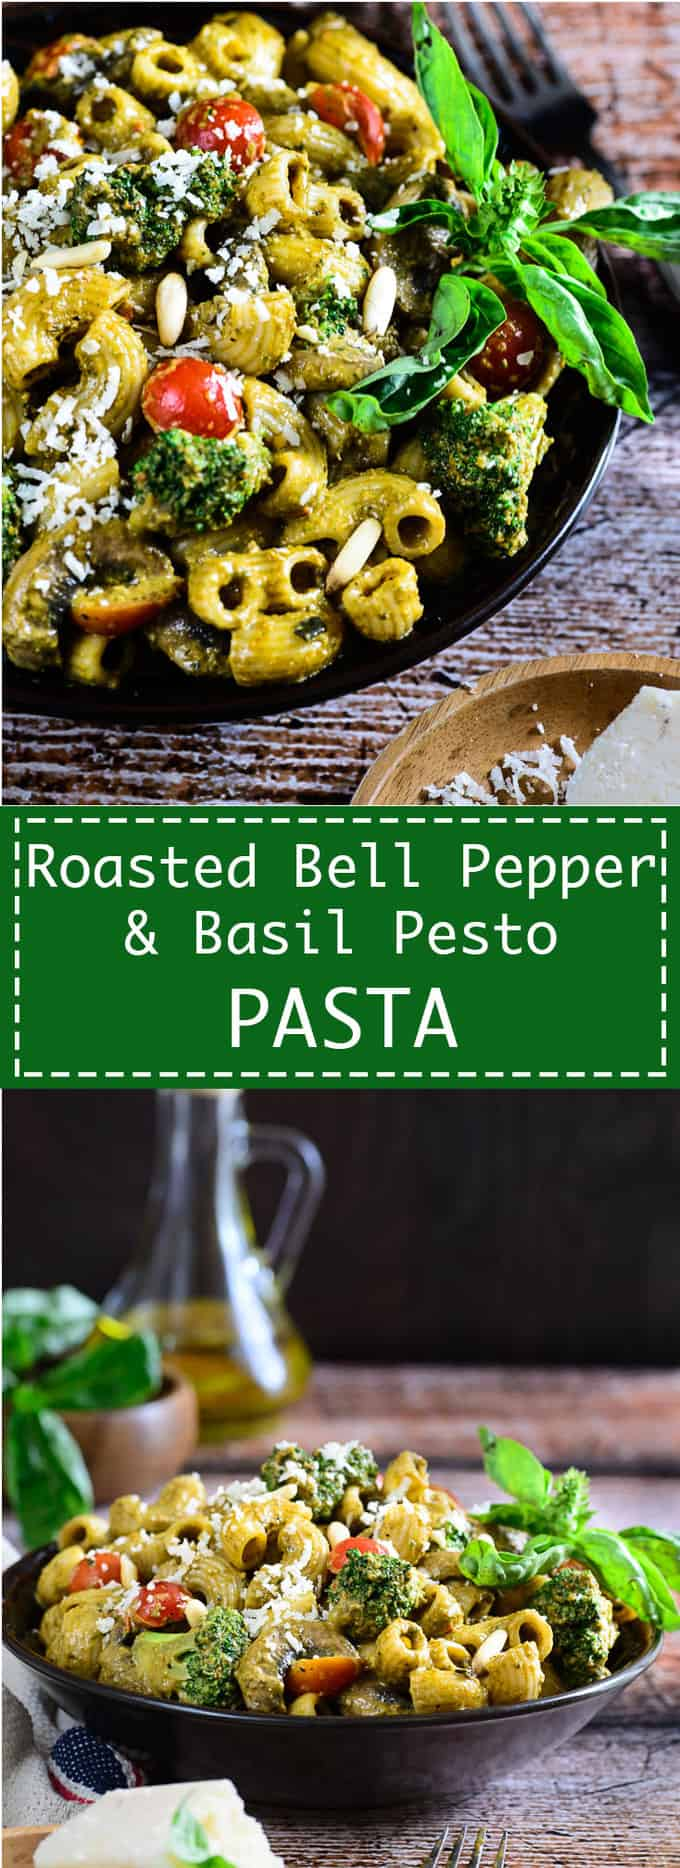 Roasted Bell Pepper Pasta